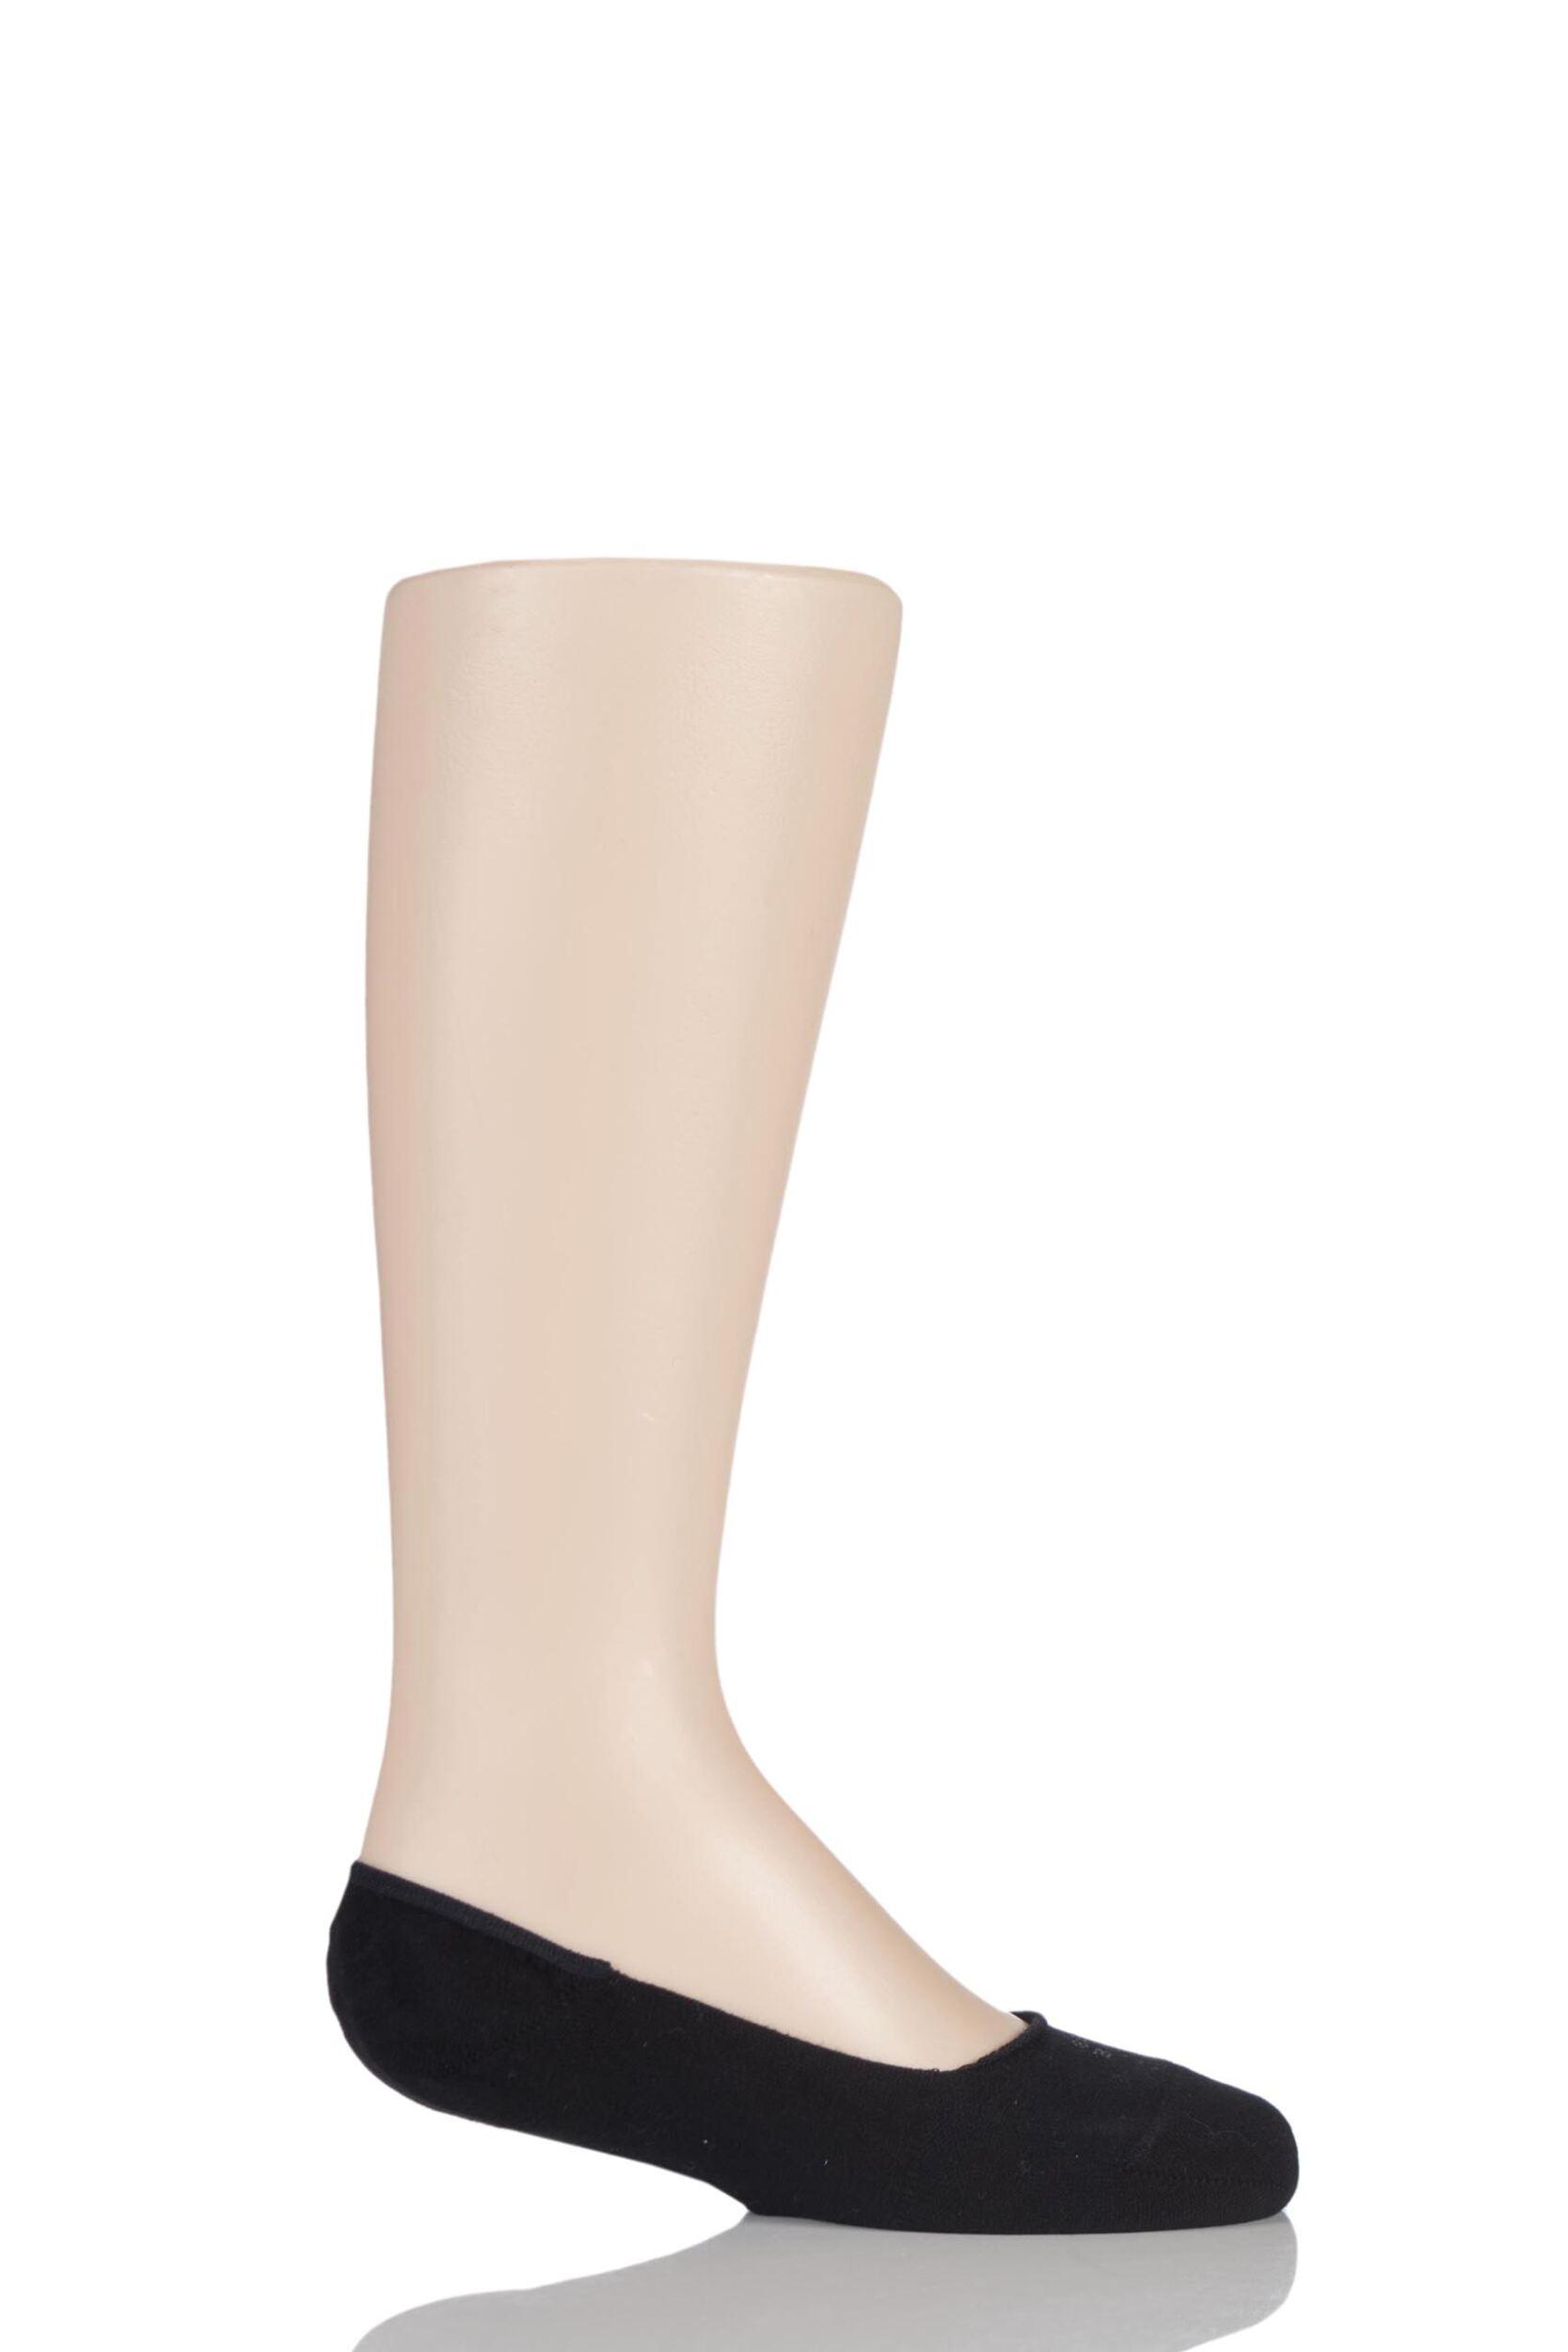 1 Pair Black Invisible Step Shoe Liners Kids Unisex 9-11.5 Kids (4-6 Years) - Falke